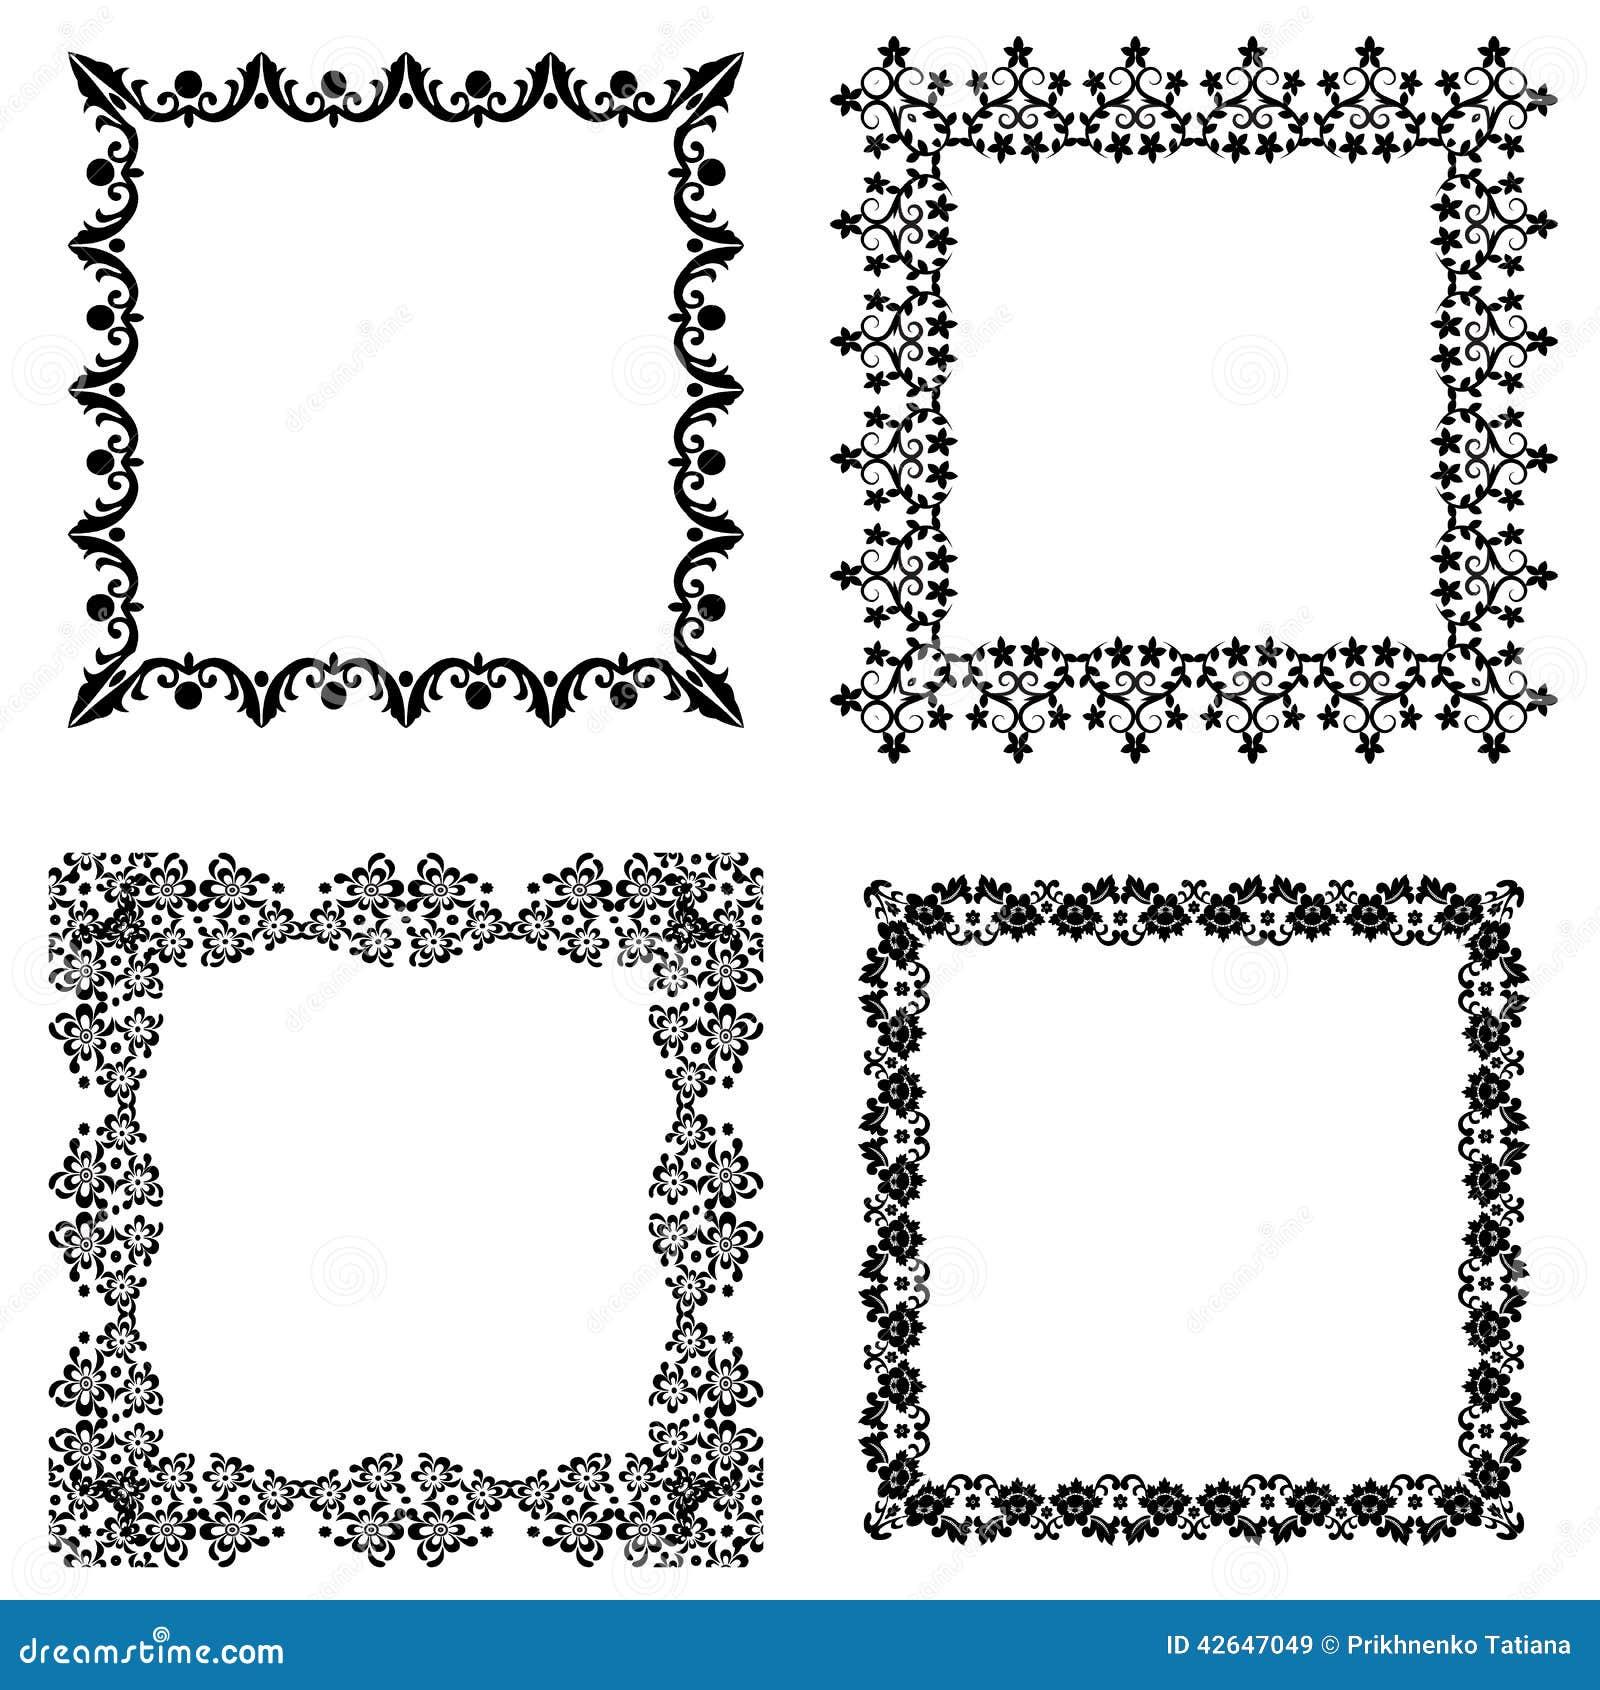 7d7a4d0796e Set frame stock vector. Illustration of black